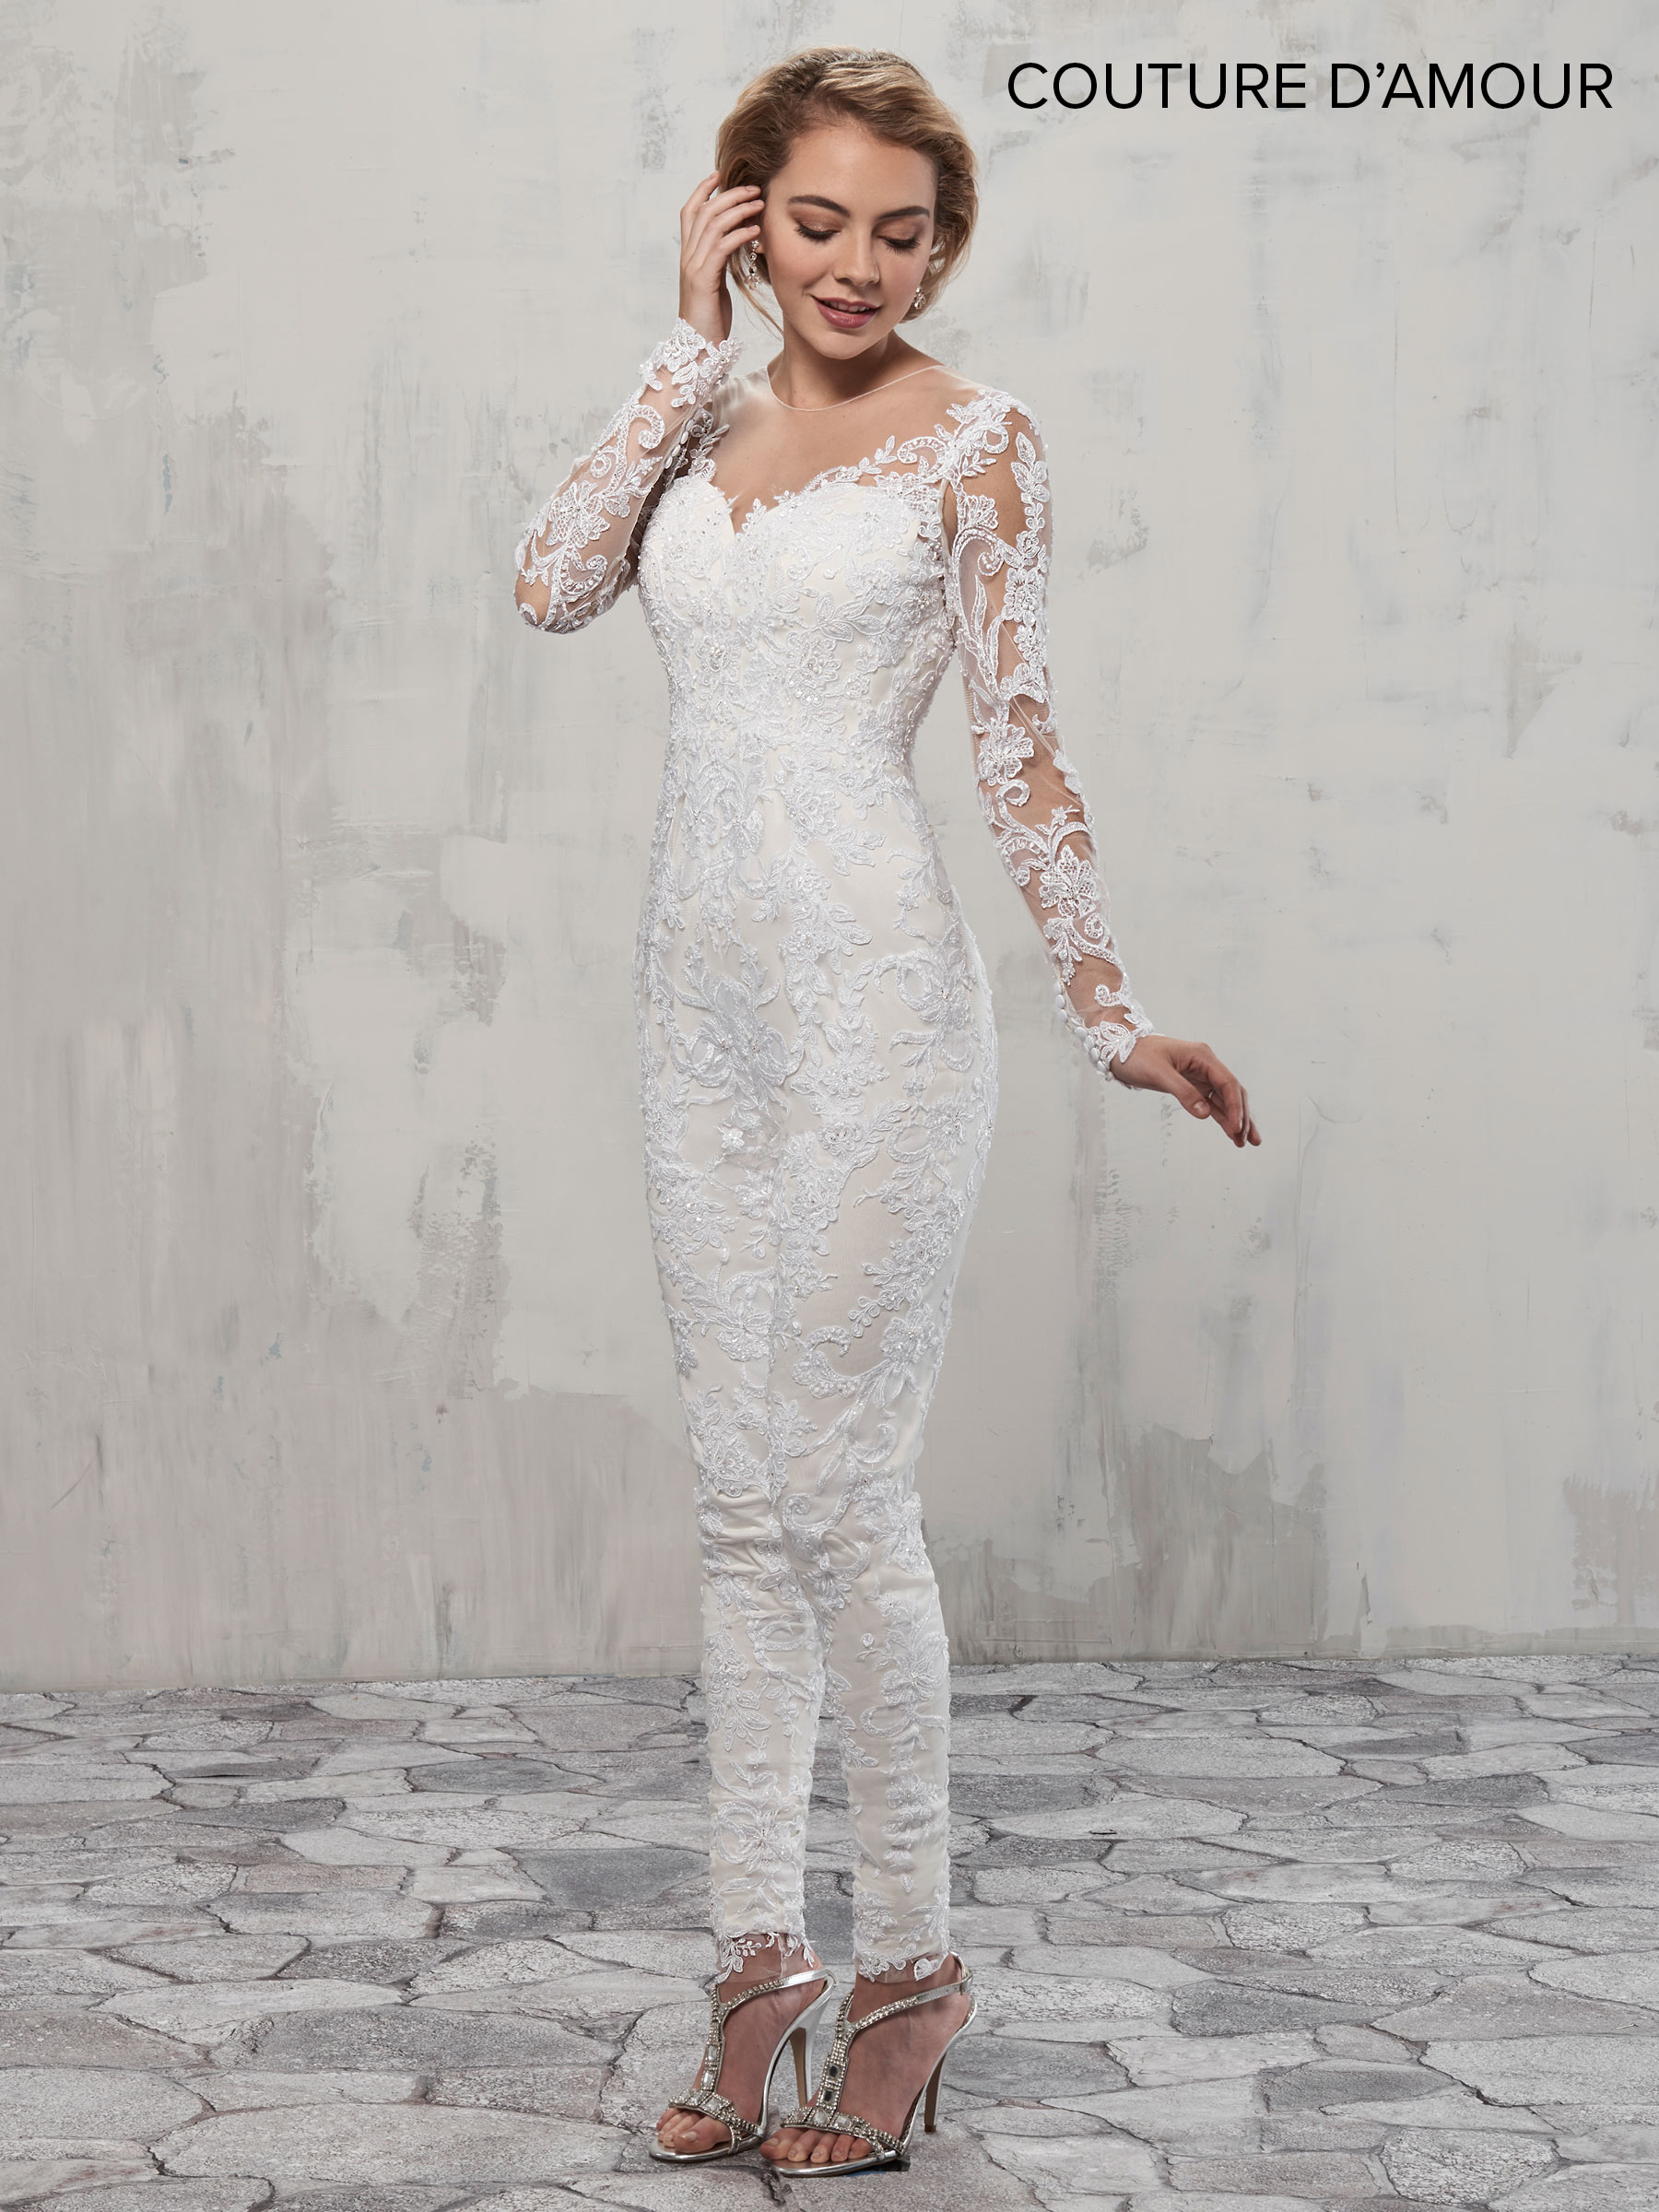 095874c4468f ... Couture Damour Bridal Dresses